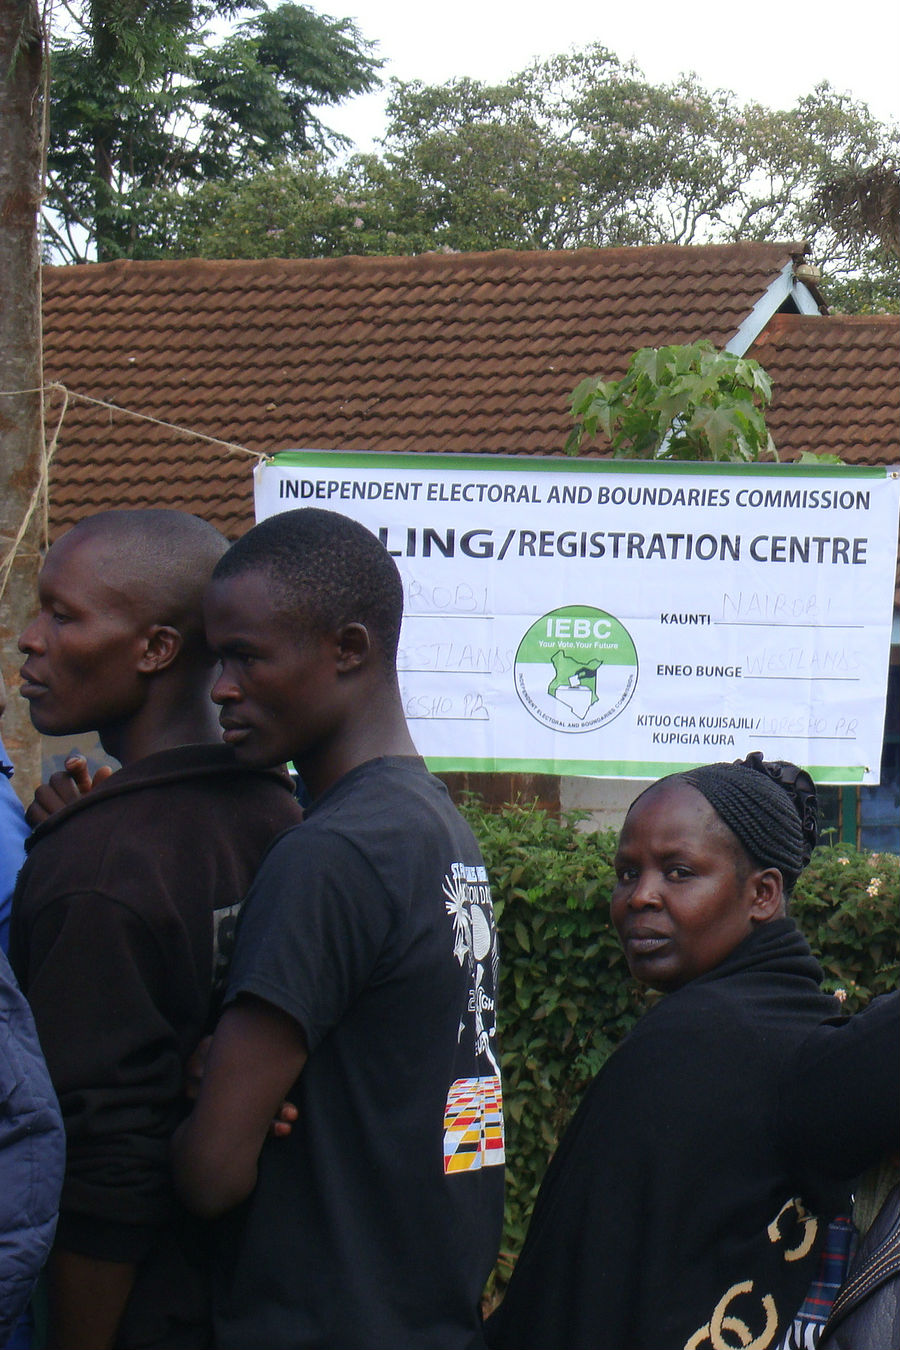 Kenya: An IEBC polling/registration centre